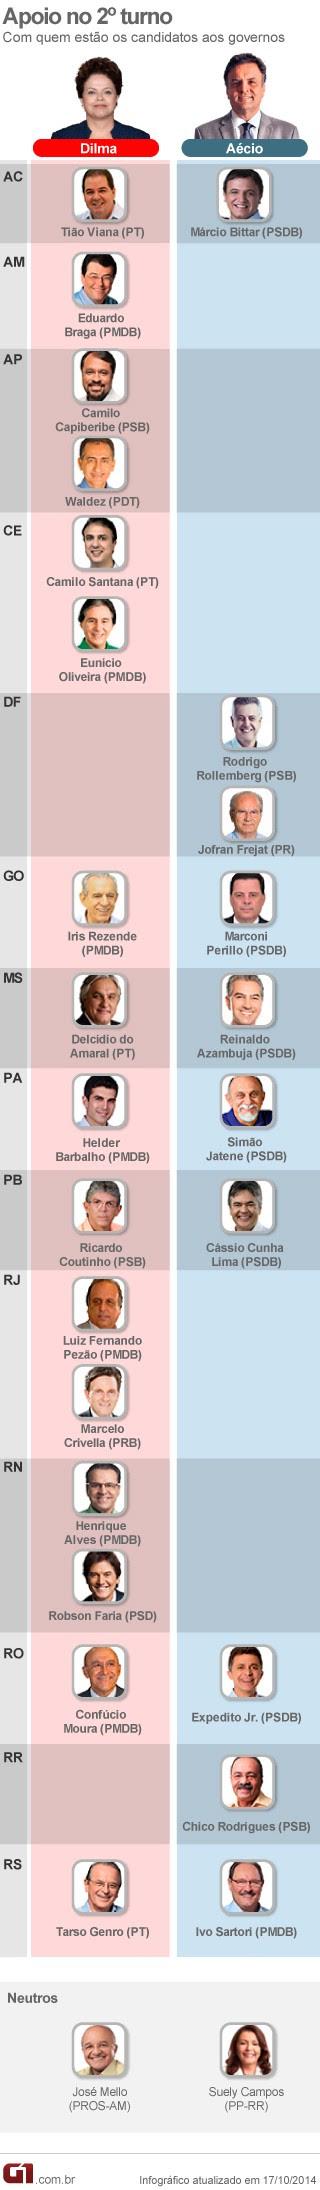 Apoios a presidenciáveis de candidatos a governador no segundo turno (Foto: Editoria de Arte / G1)